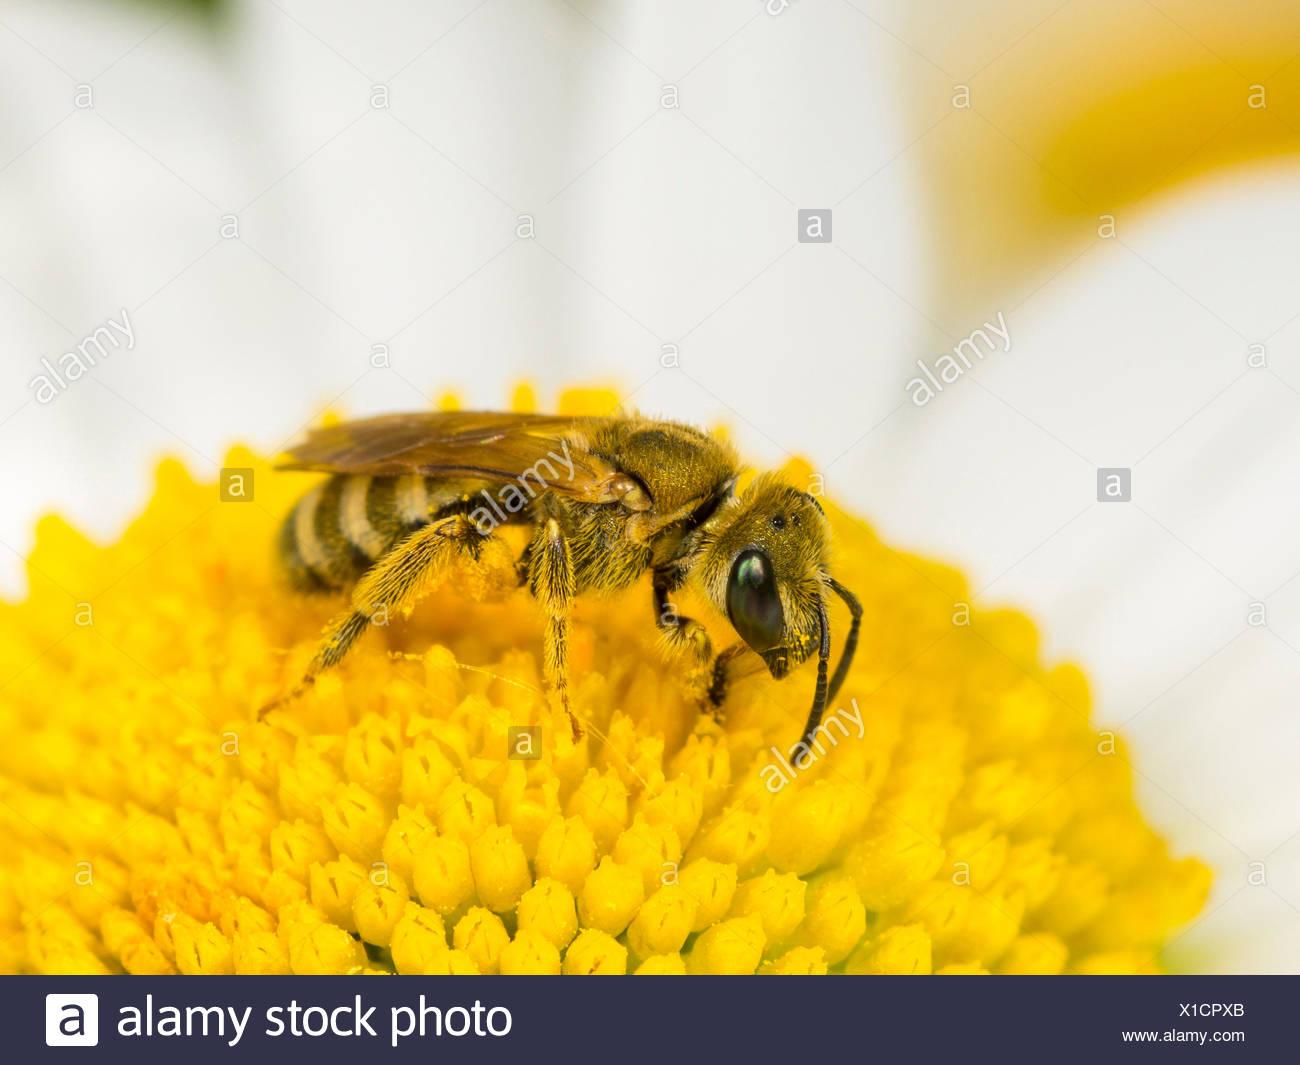 Sweat bee (Halictus confusus), female foraging foraging on oy-eye daisy (Leucanthemum vulgare), Germany - Stock Image